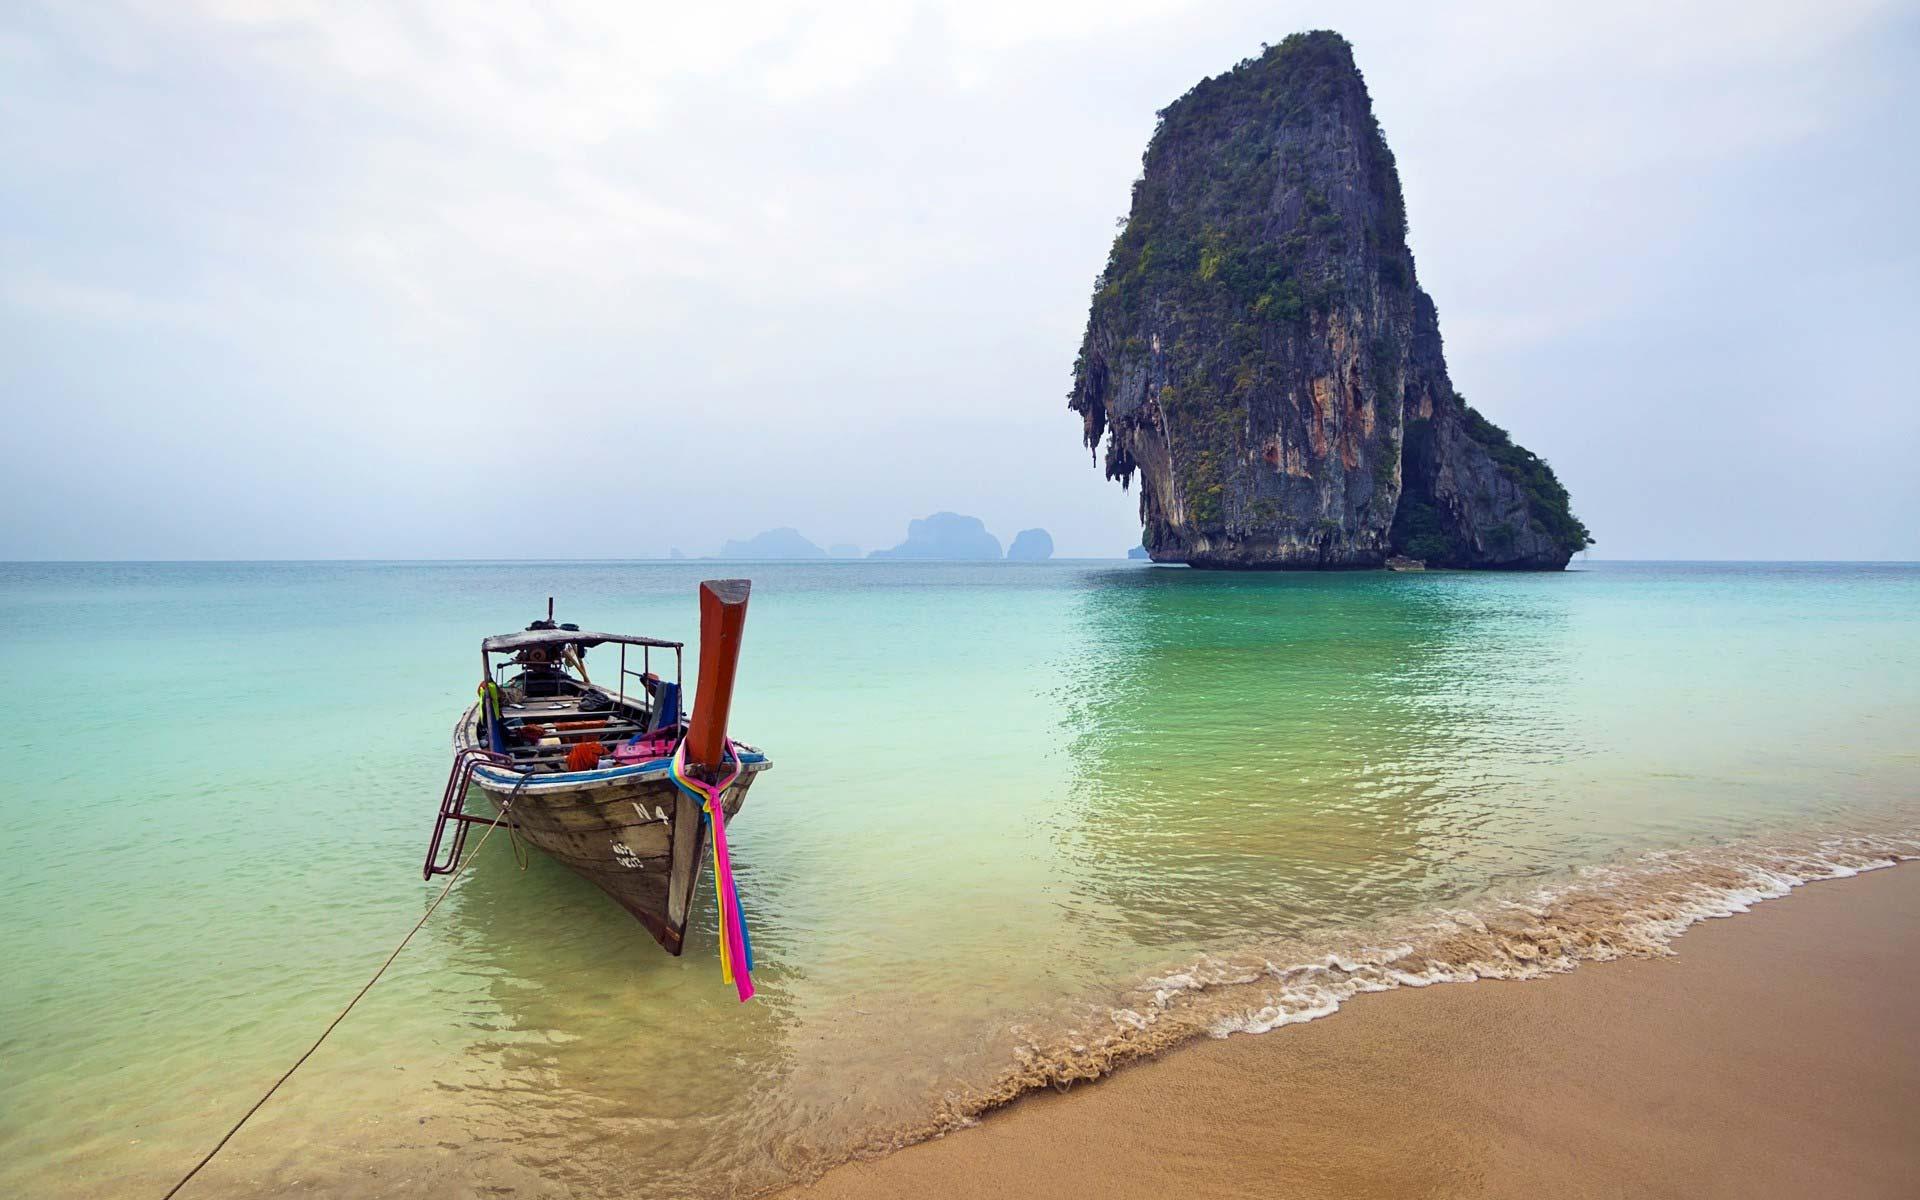 barco-barado-playa-paradisiaca